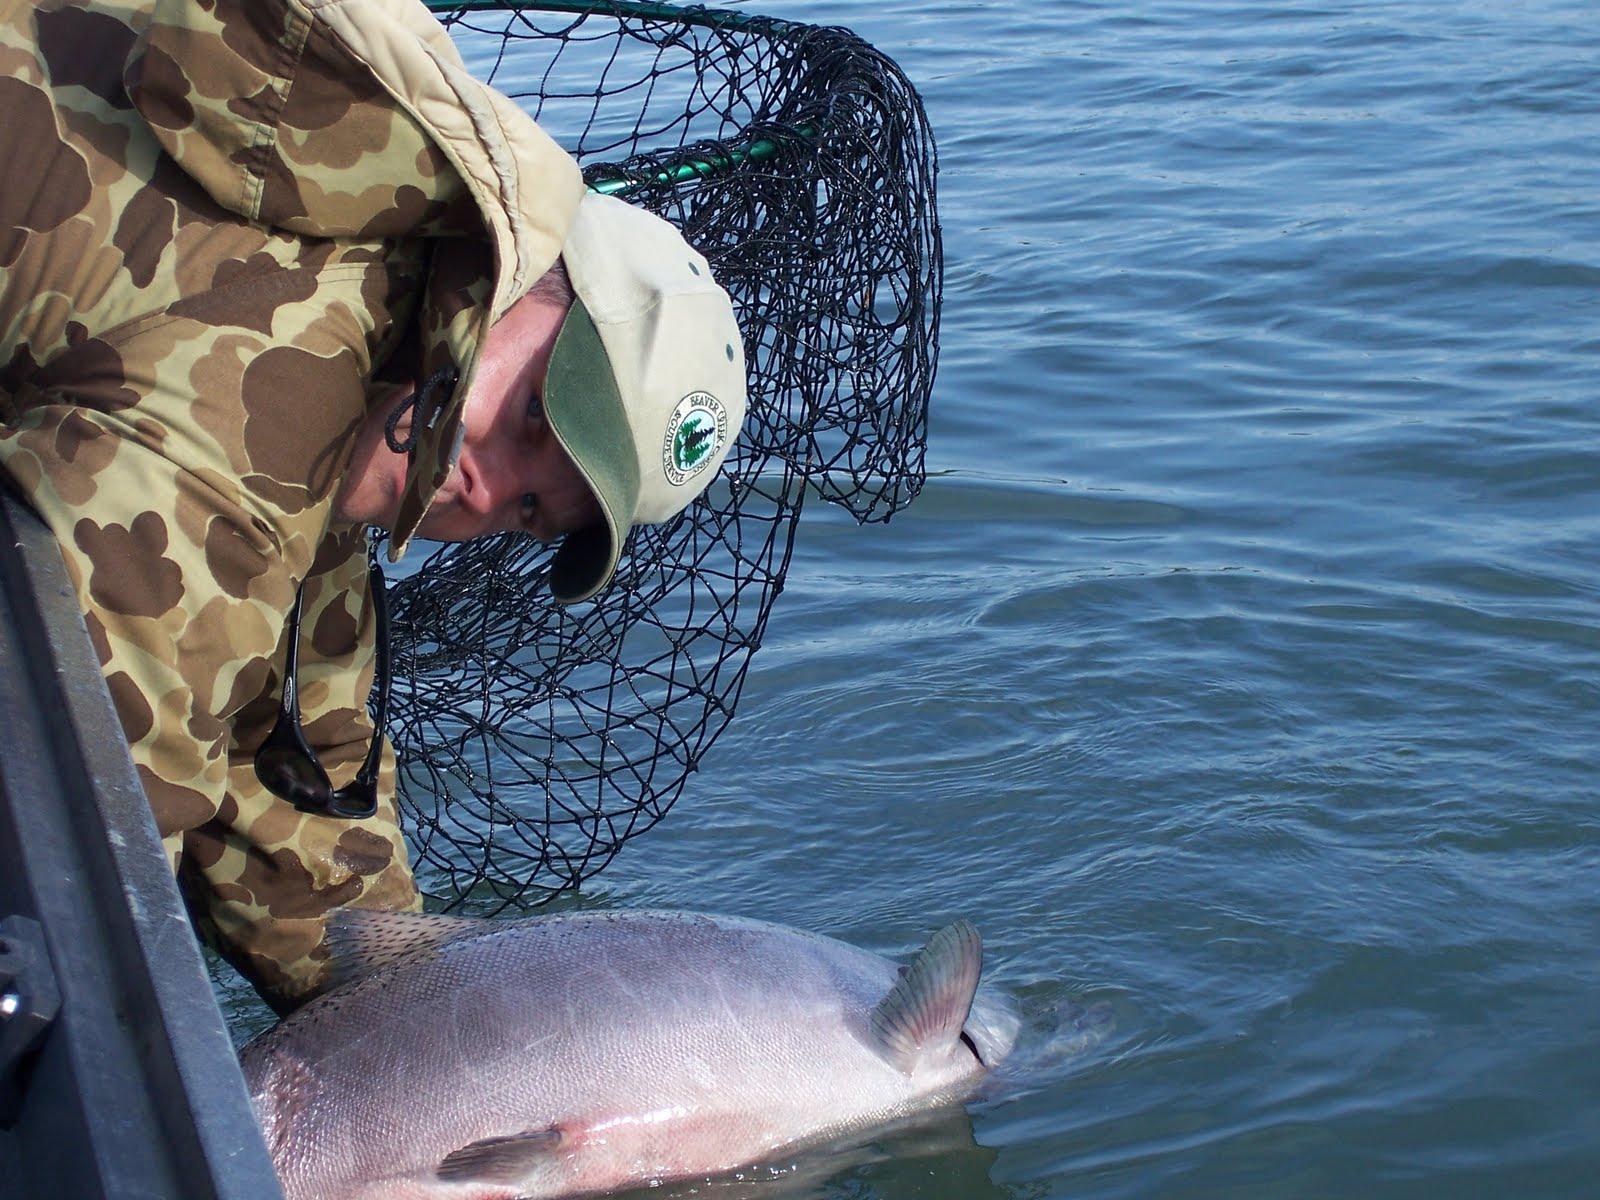 Beaver creek cabins guide service kenai river to reopen for Kenai river fish counts